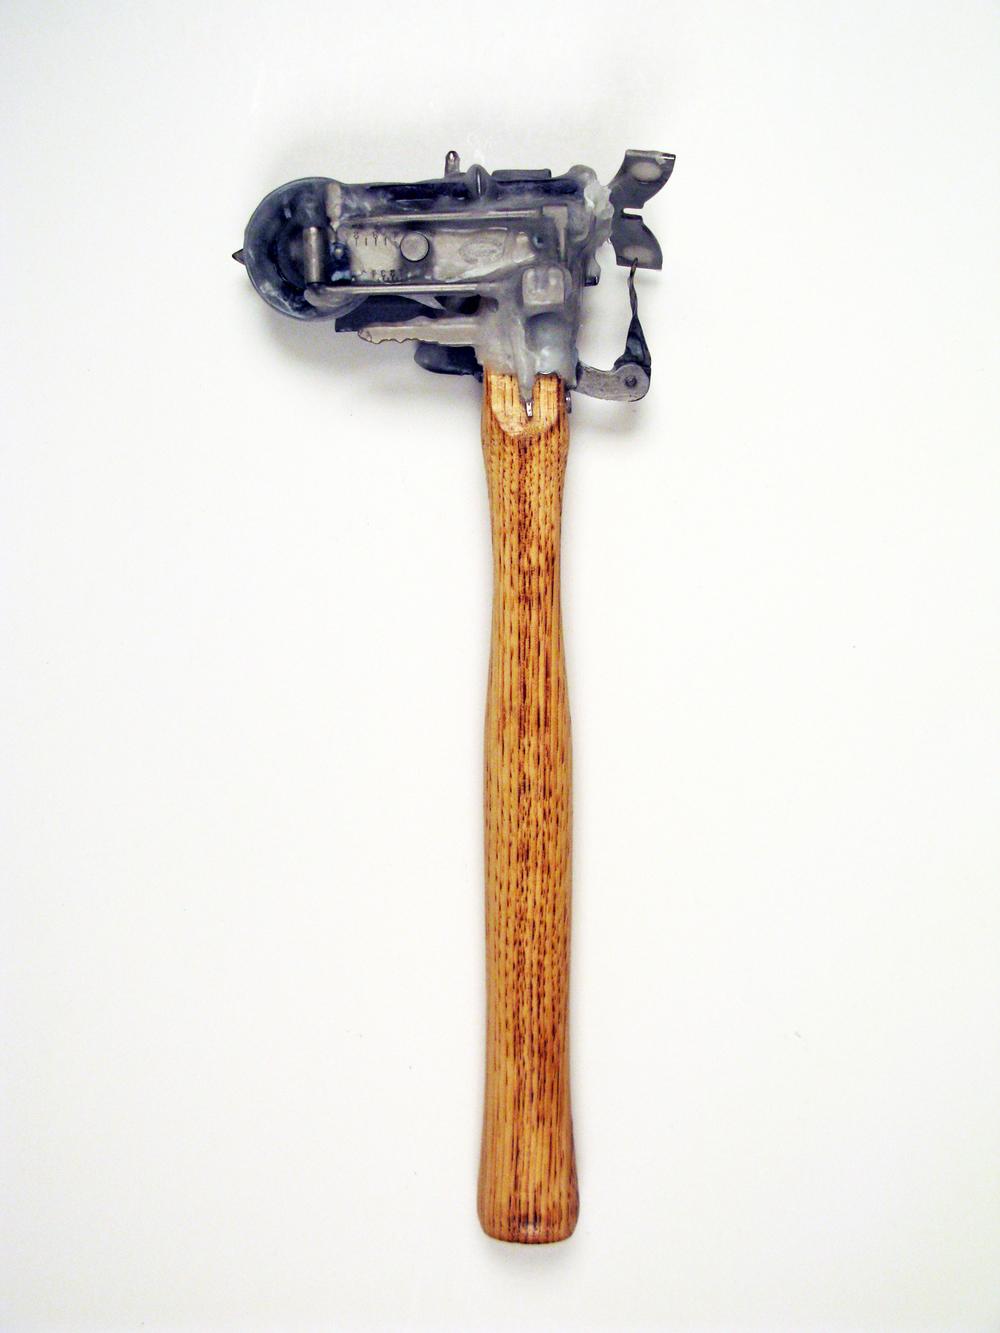 Modern Hammer Opener Wax.jpg